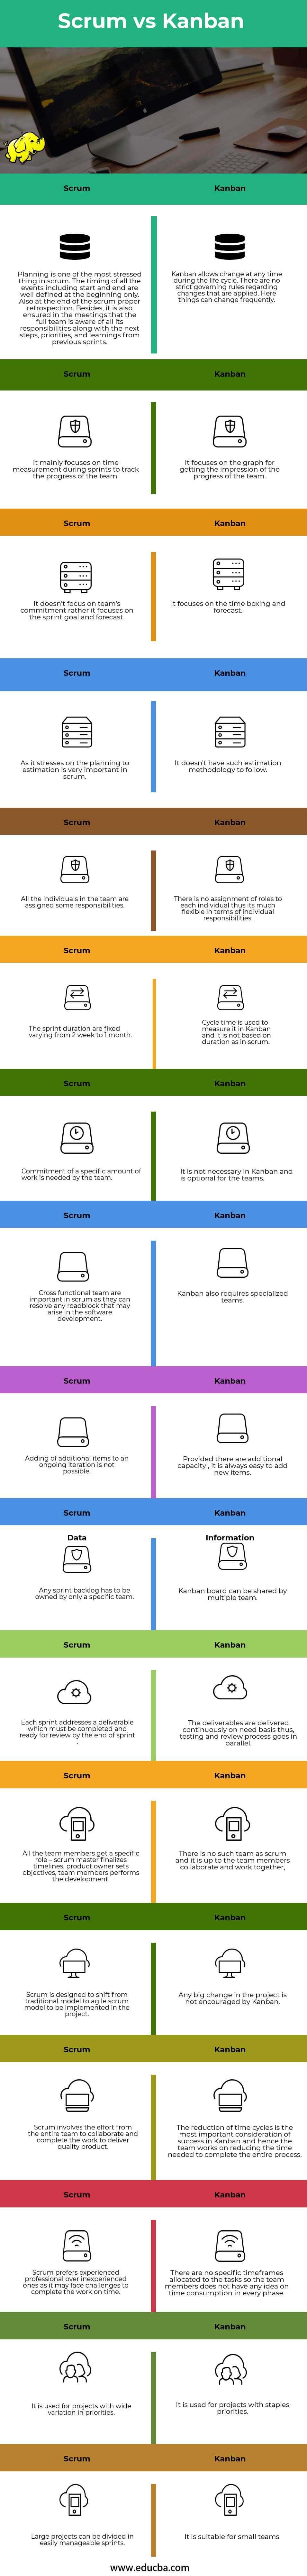 Scrum vs Kanban infographics